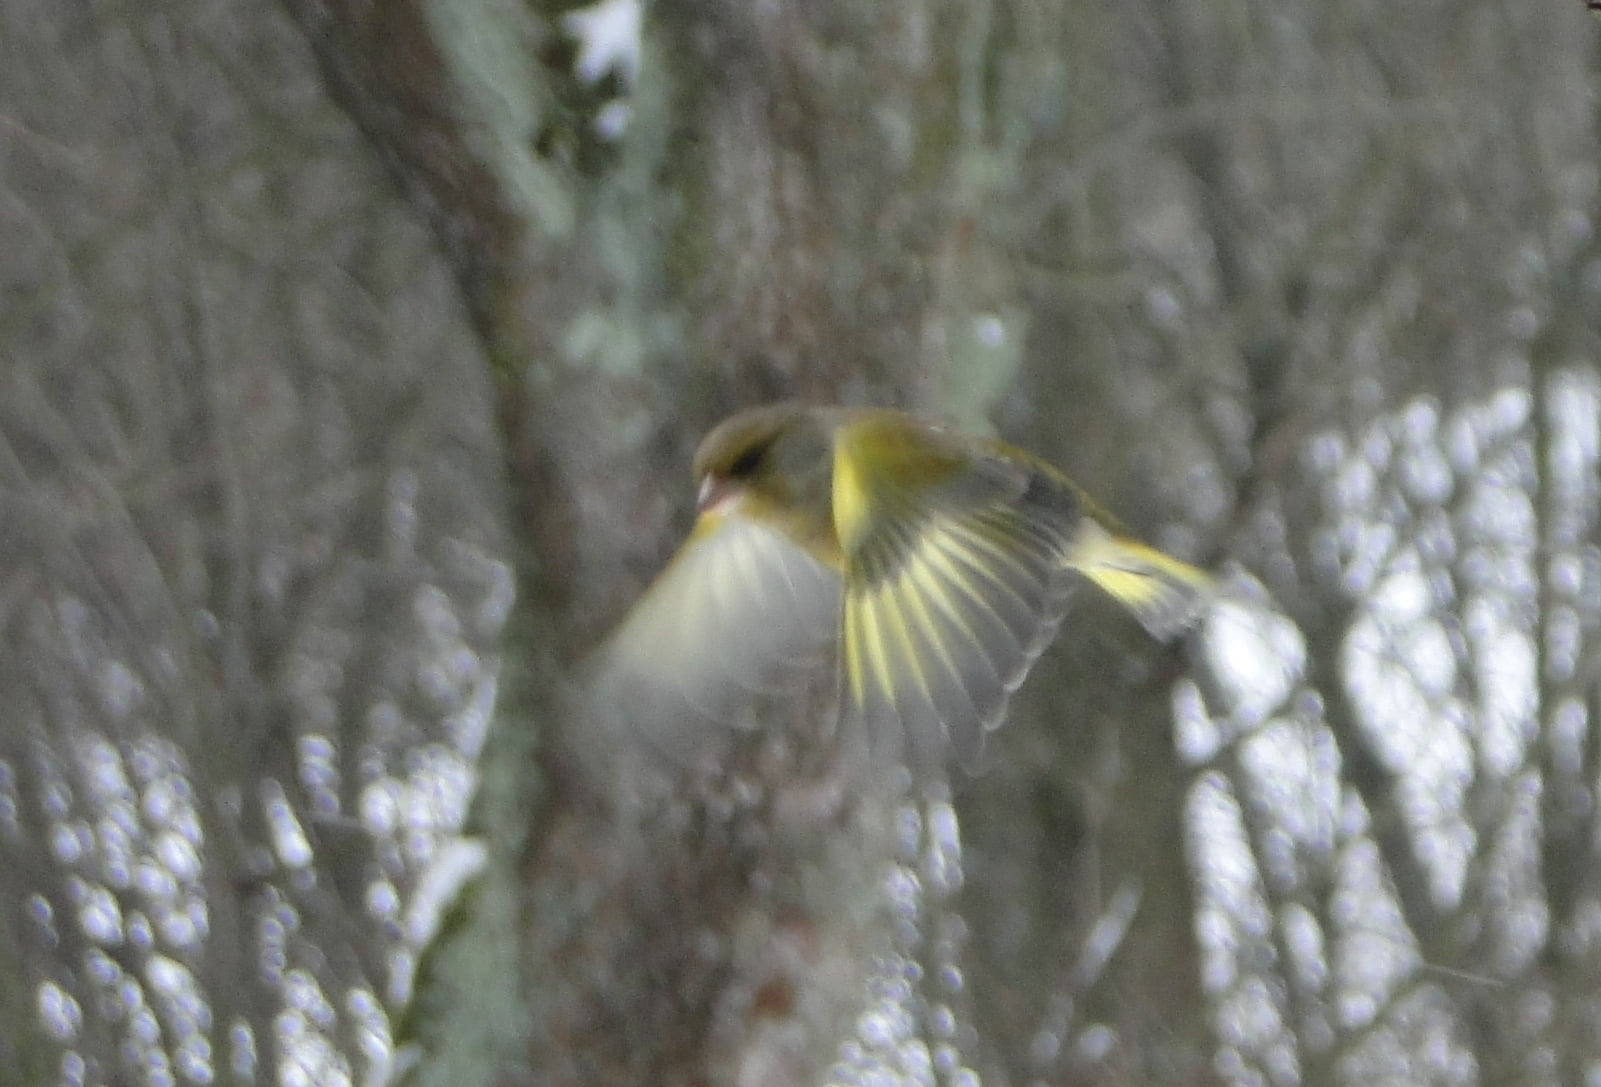 Nasi zimowi ptasi przyjaciele 8